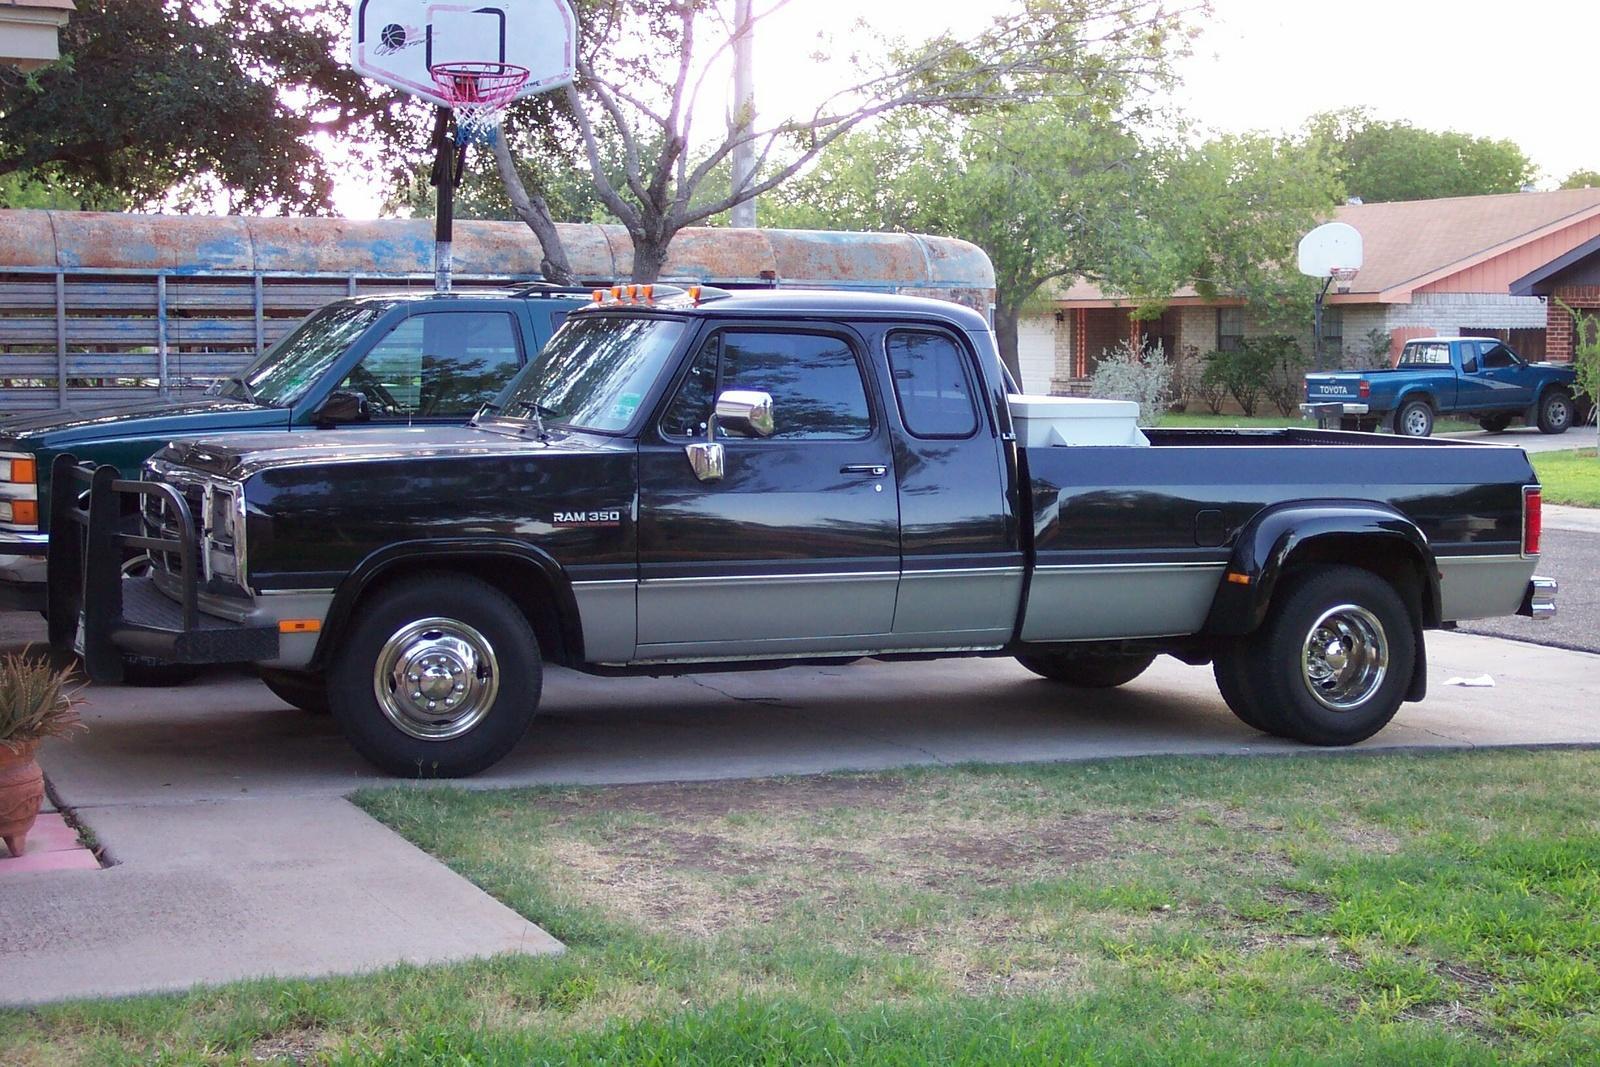 1991 Dodge RAM 350 #9 Dodge RAM 350 #9 800 1024 1280 1600 origin ...